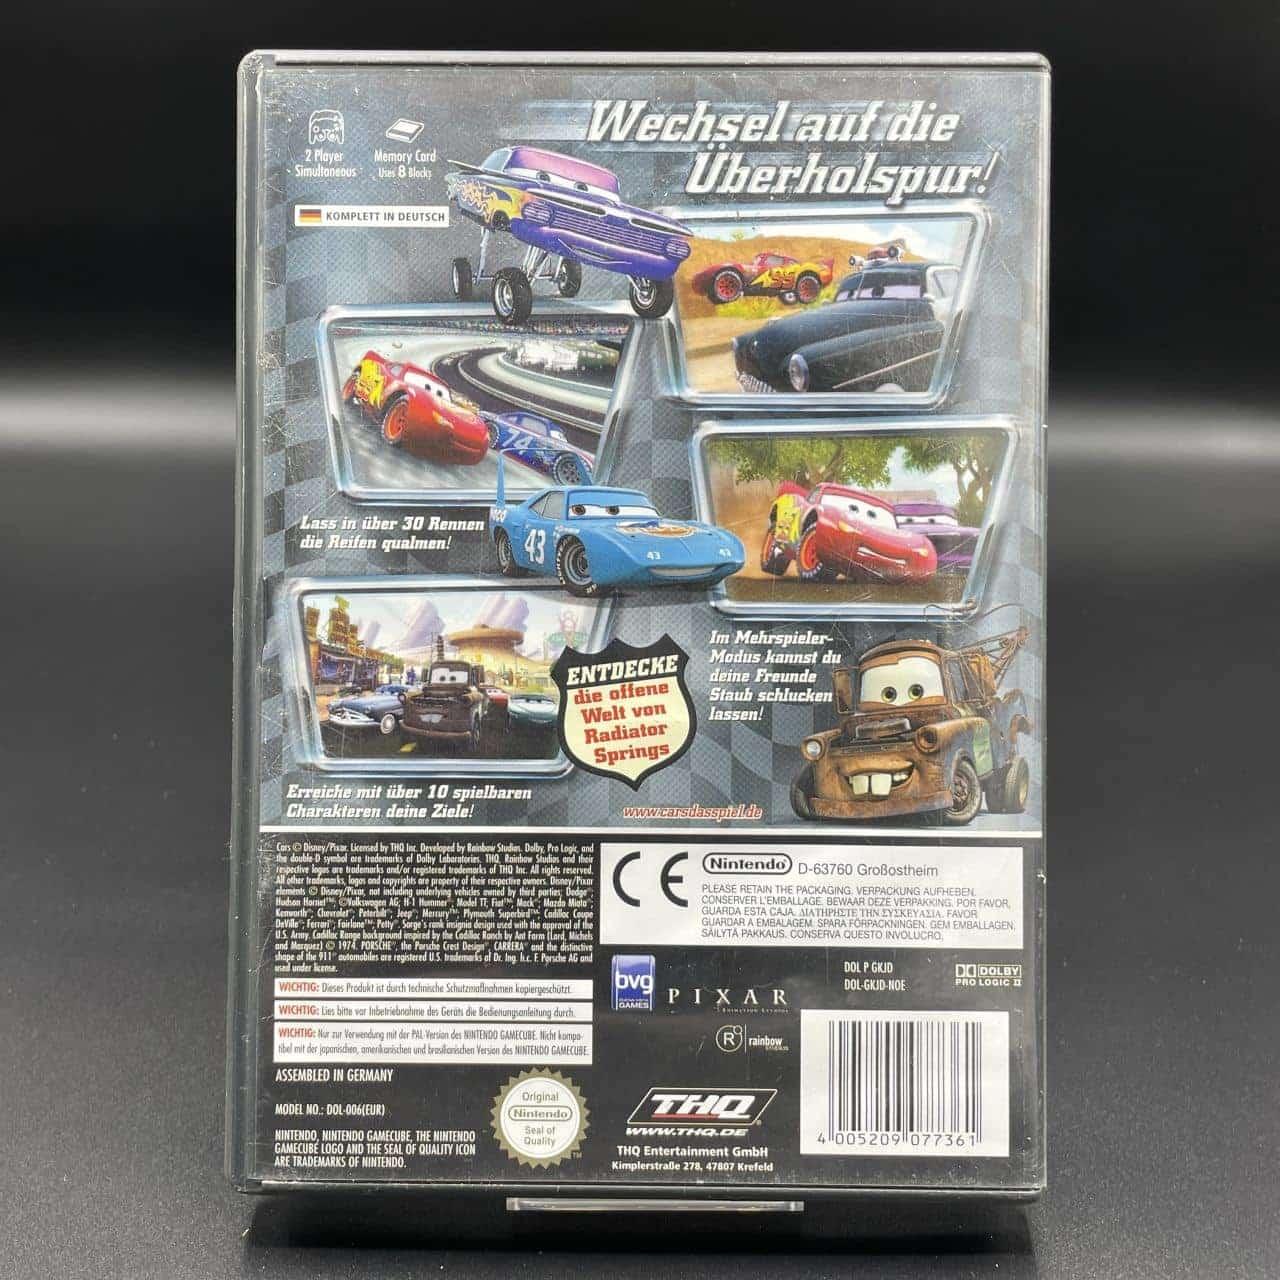 GC Disney Pixar Cars (Komplett) (Gebrauchsspuren) Nintendo GameCube